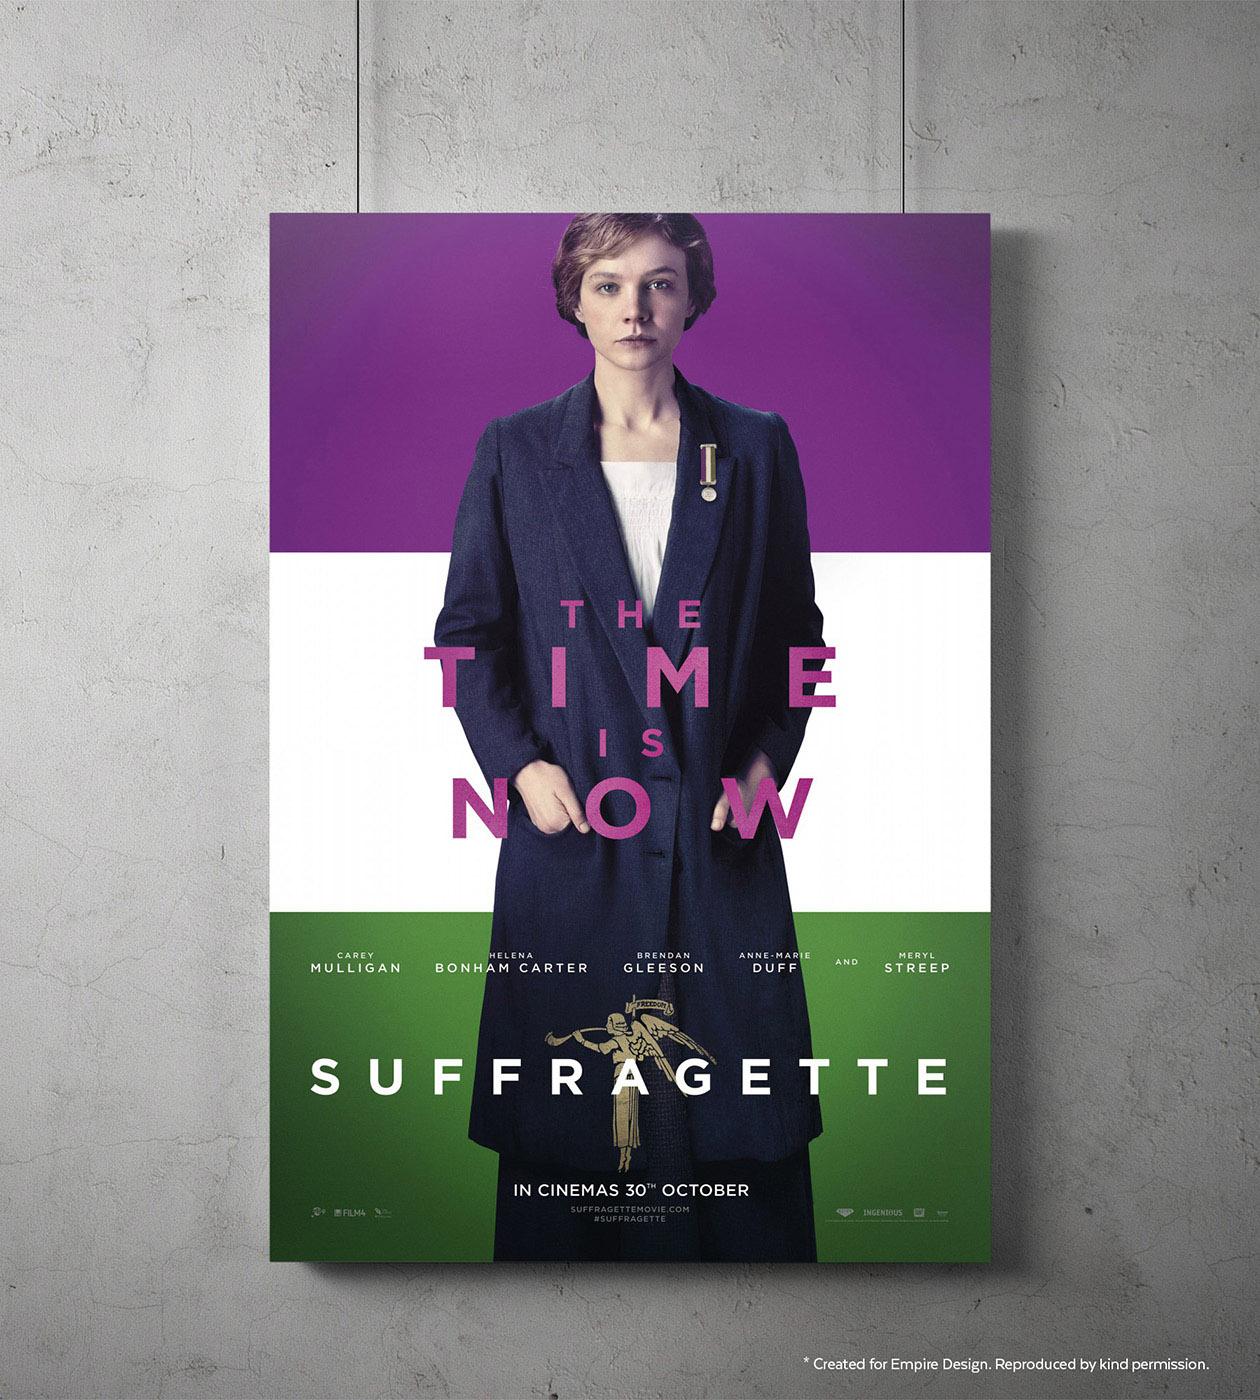 Suffragette_Character.jpg